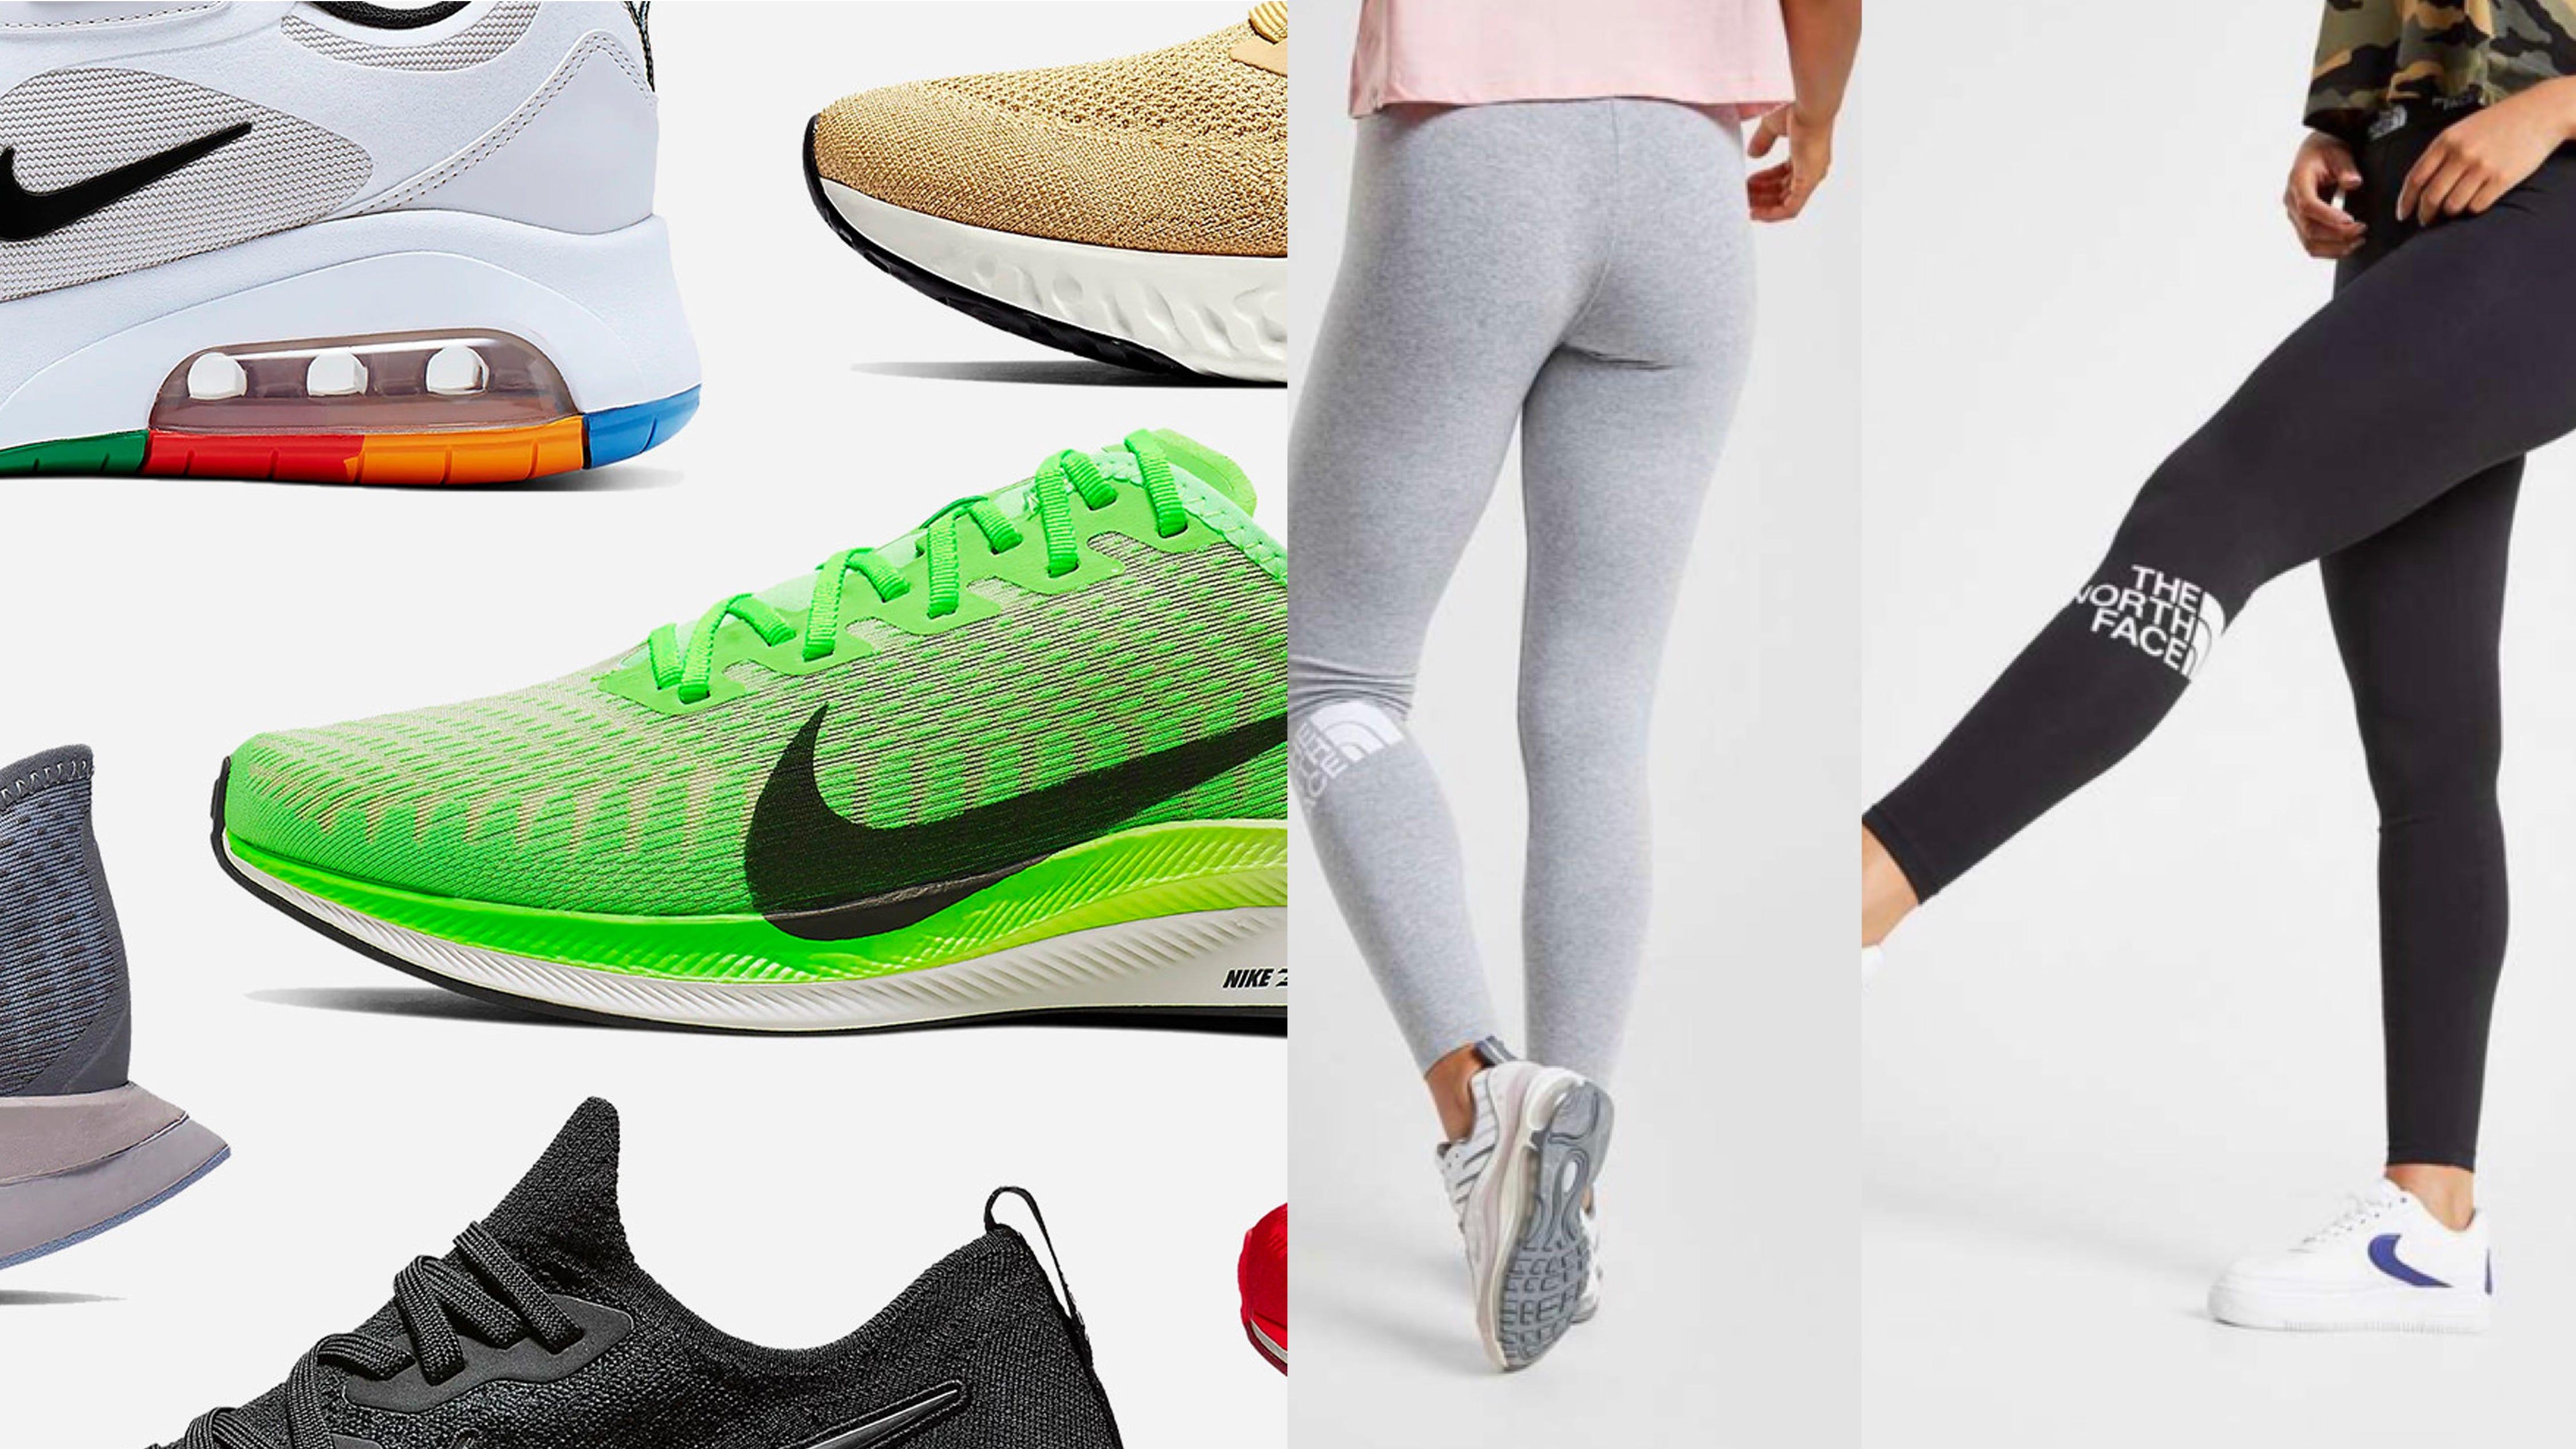 adidas sportswear activewear